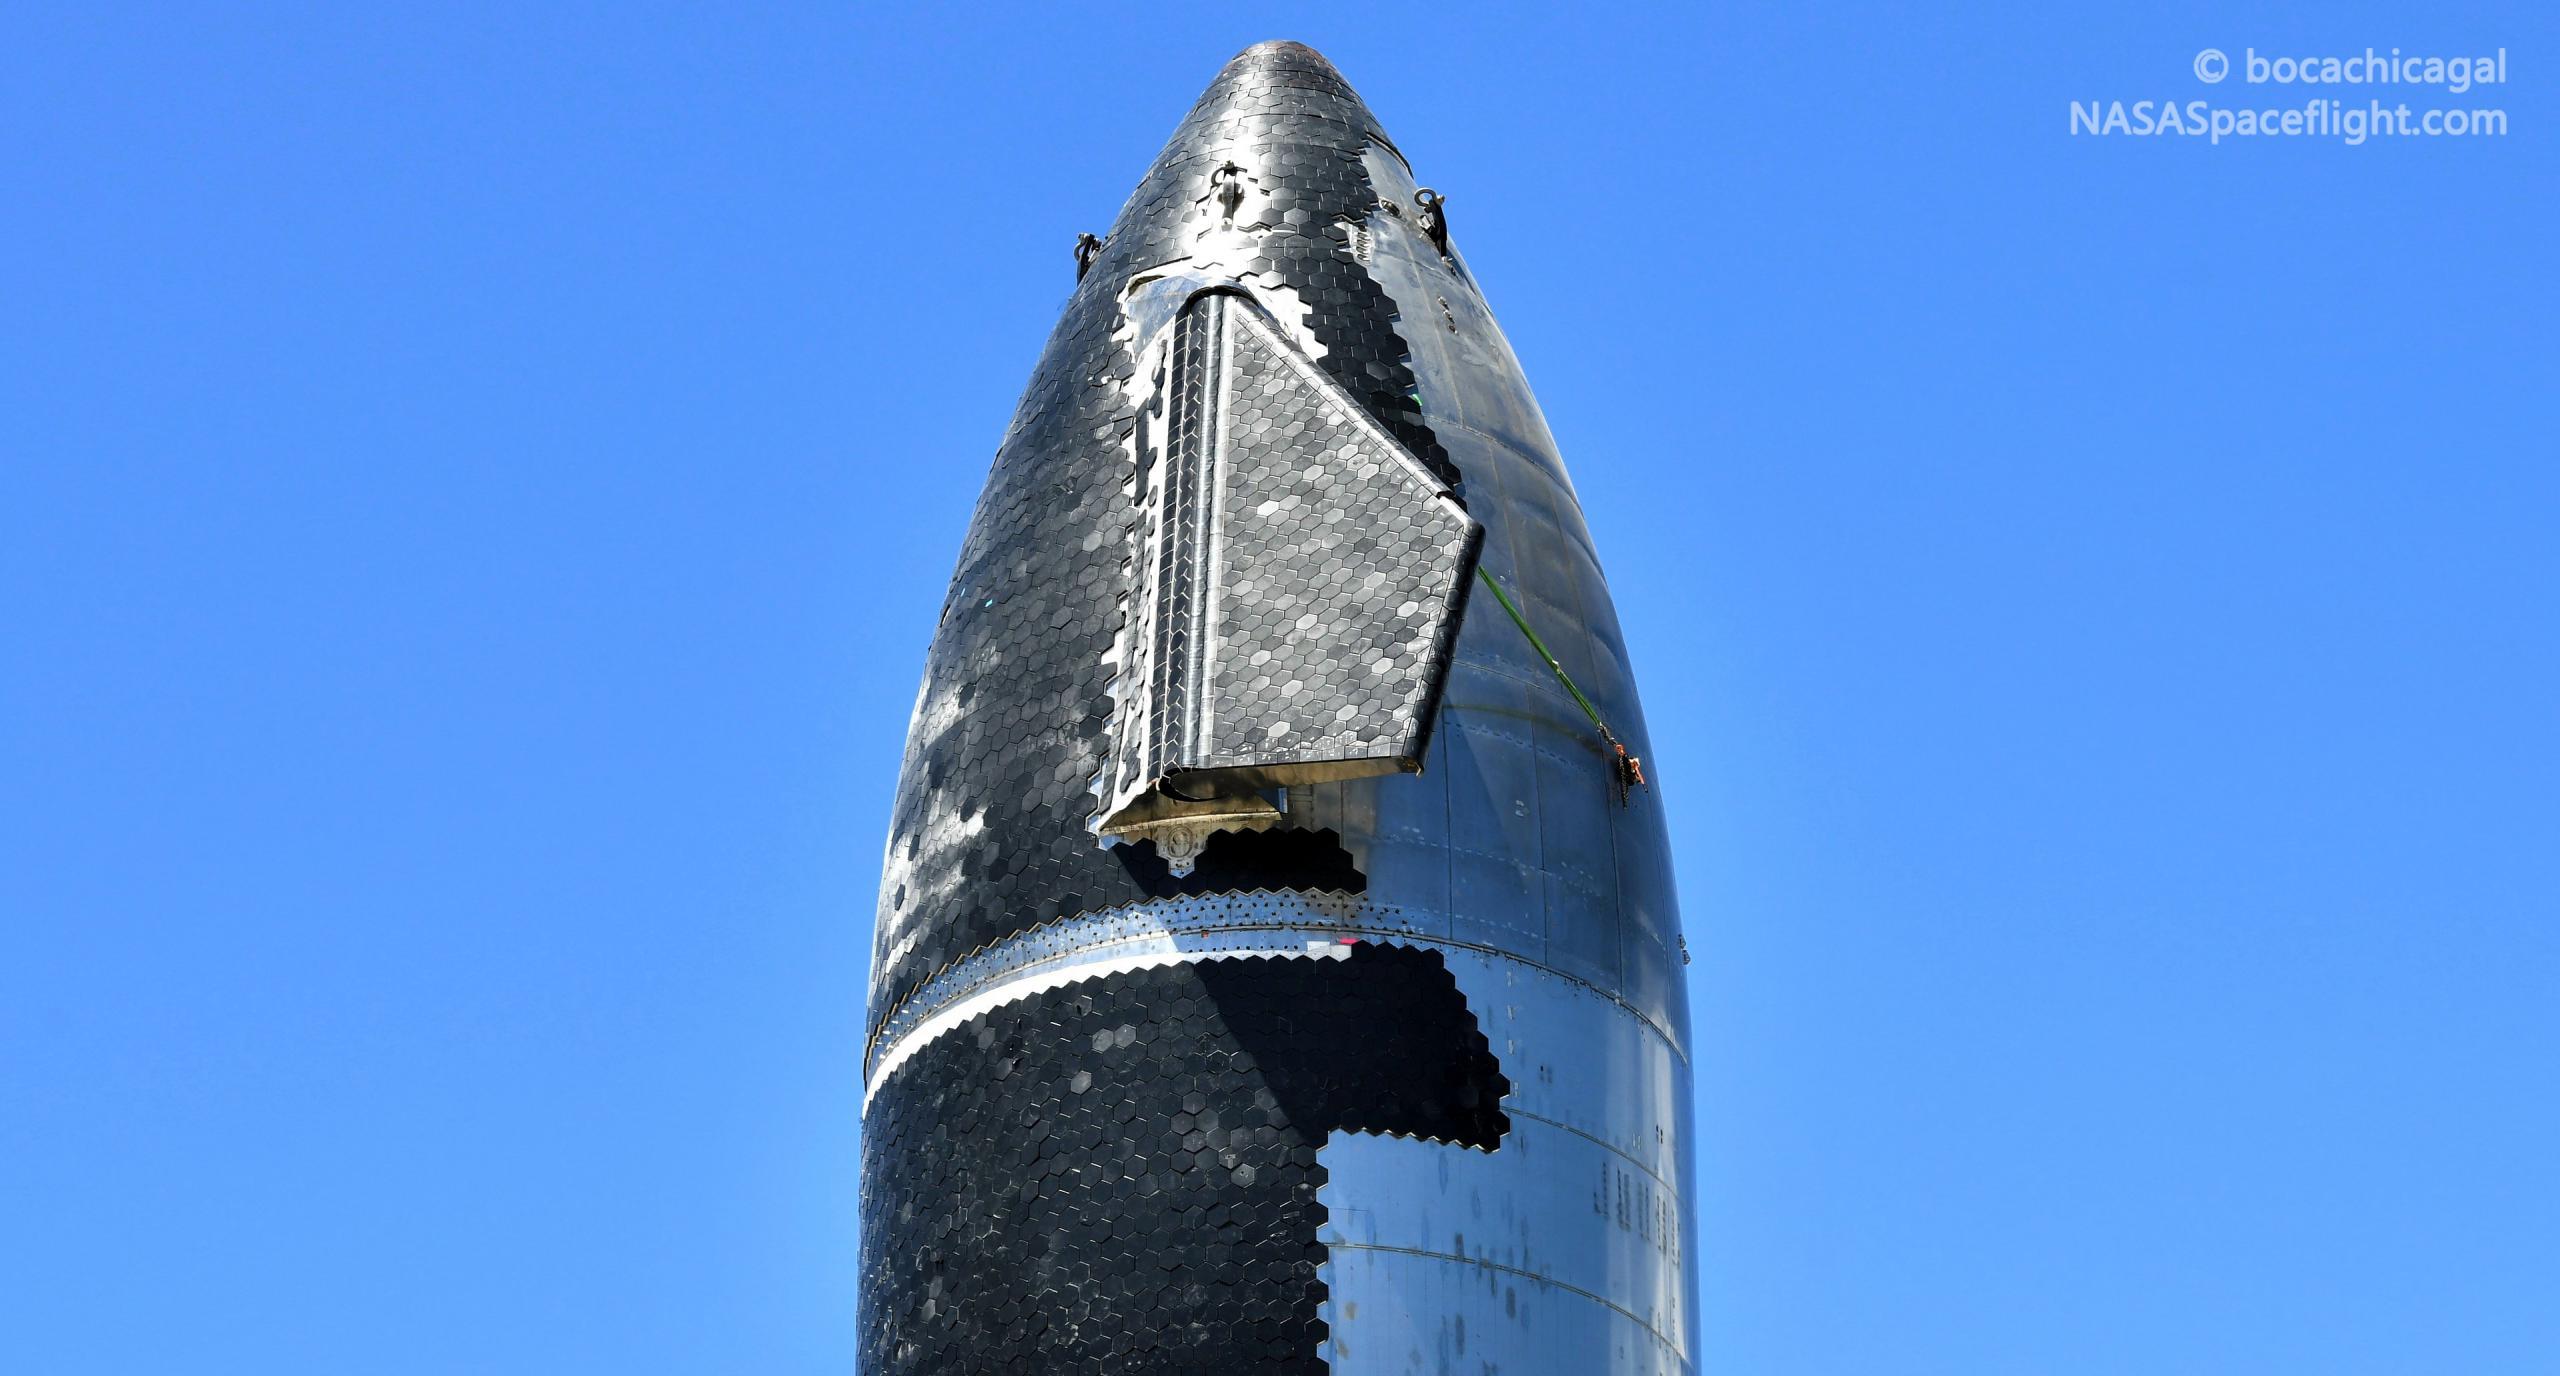 Starship Boca Chica 080521 (NASASpaceflight – bocachicagal) S20 rollout 4 crop (c)